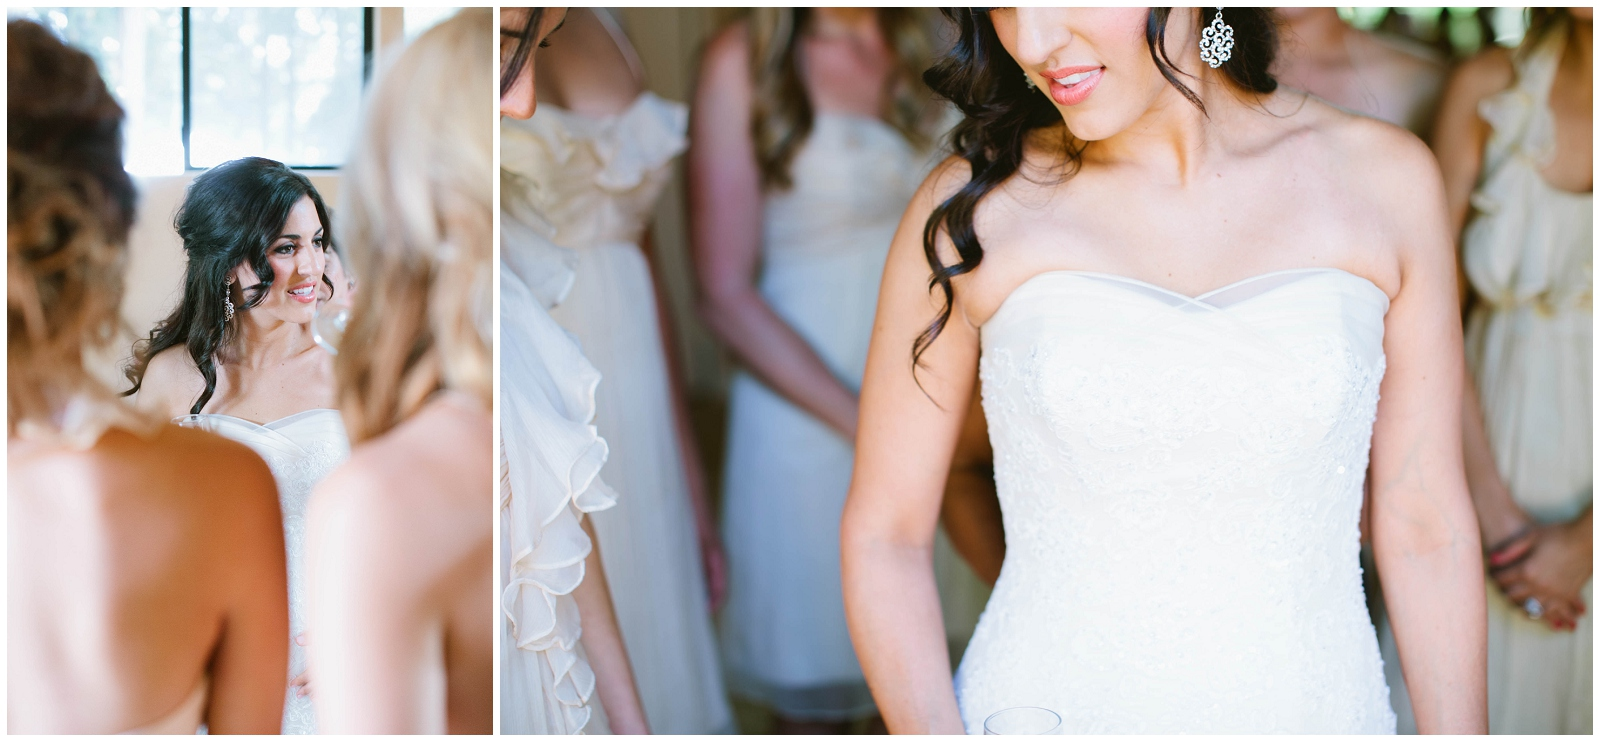 San-Francisco-Bay-Area-Wedding-Photography-Kennolyn-4.jpg